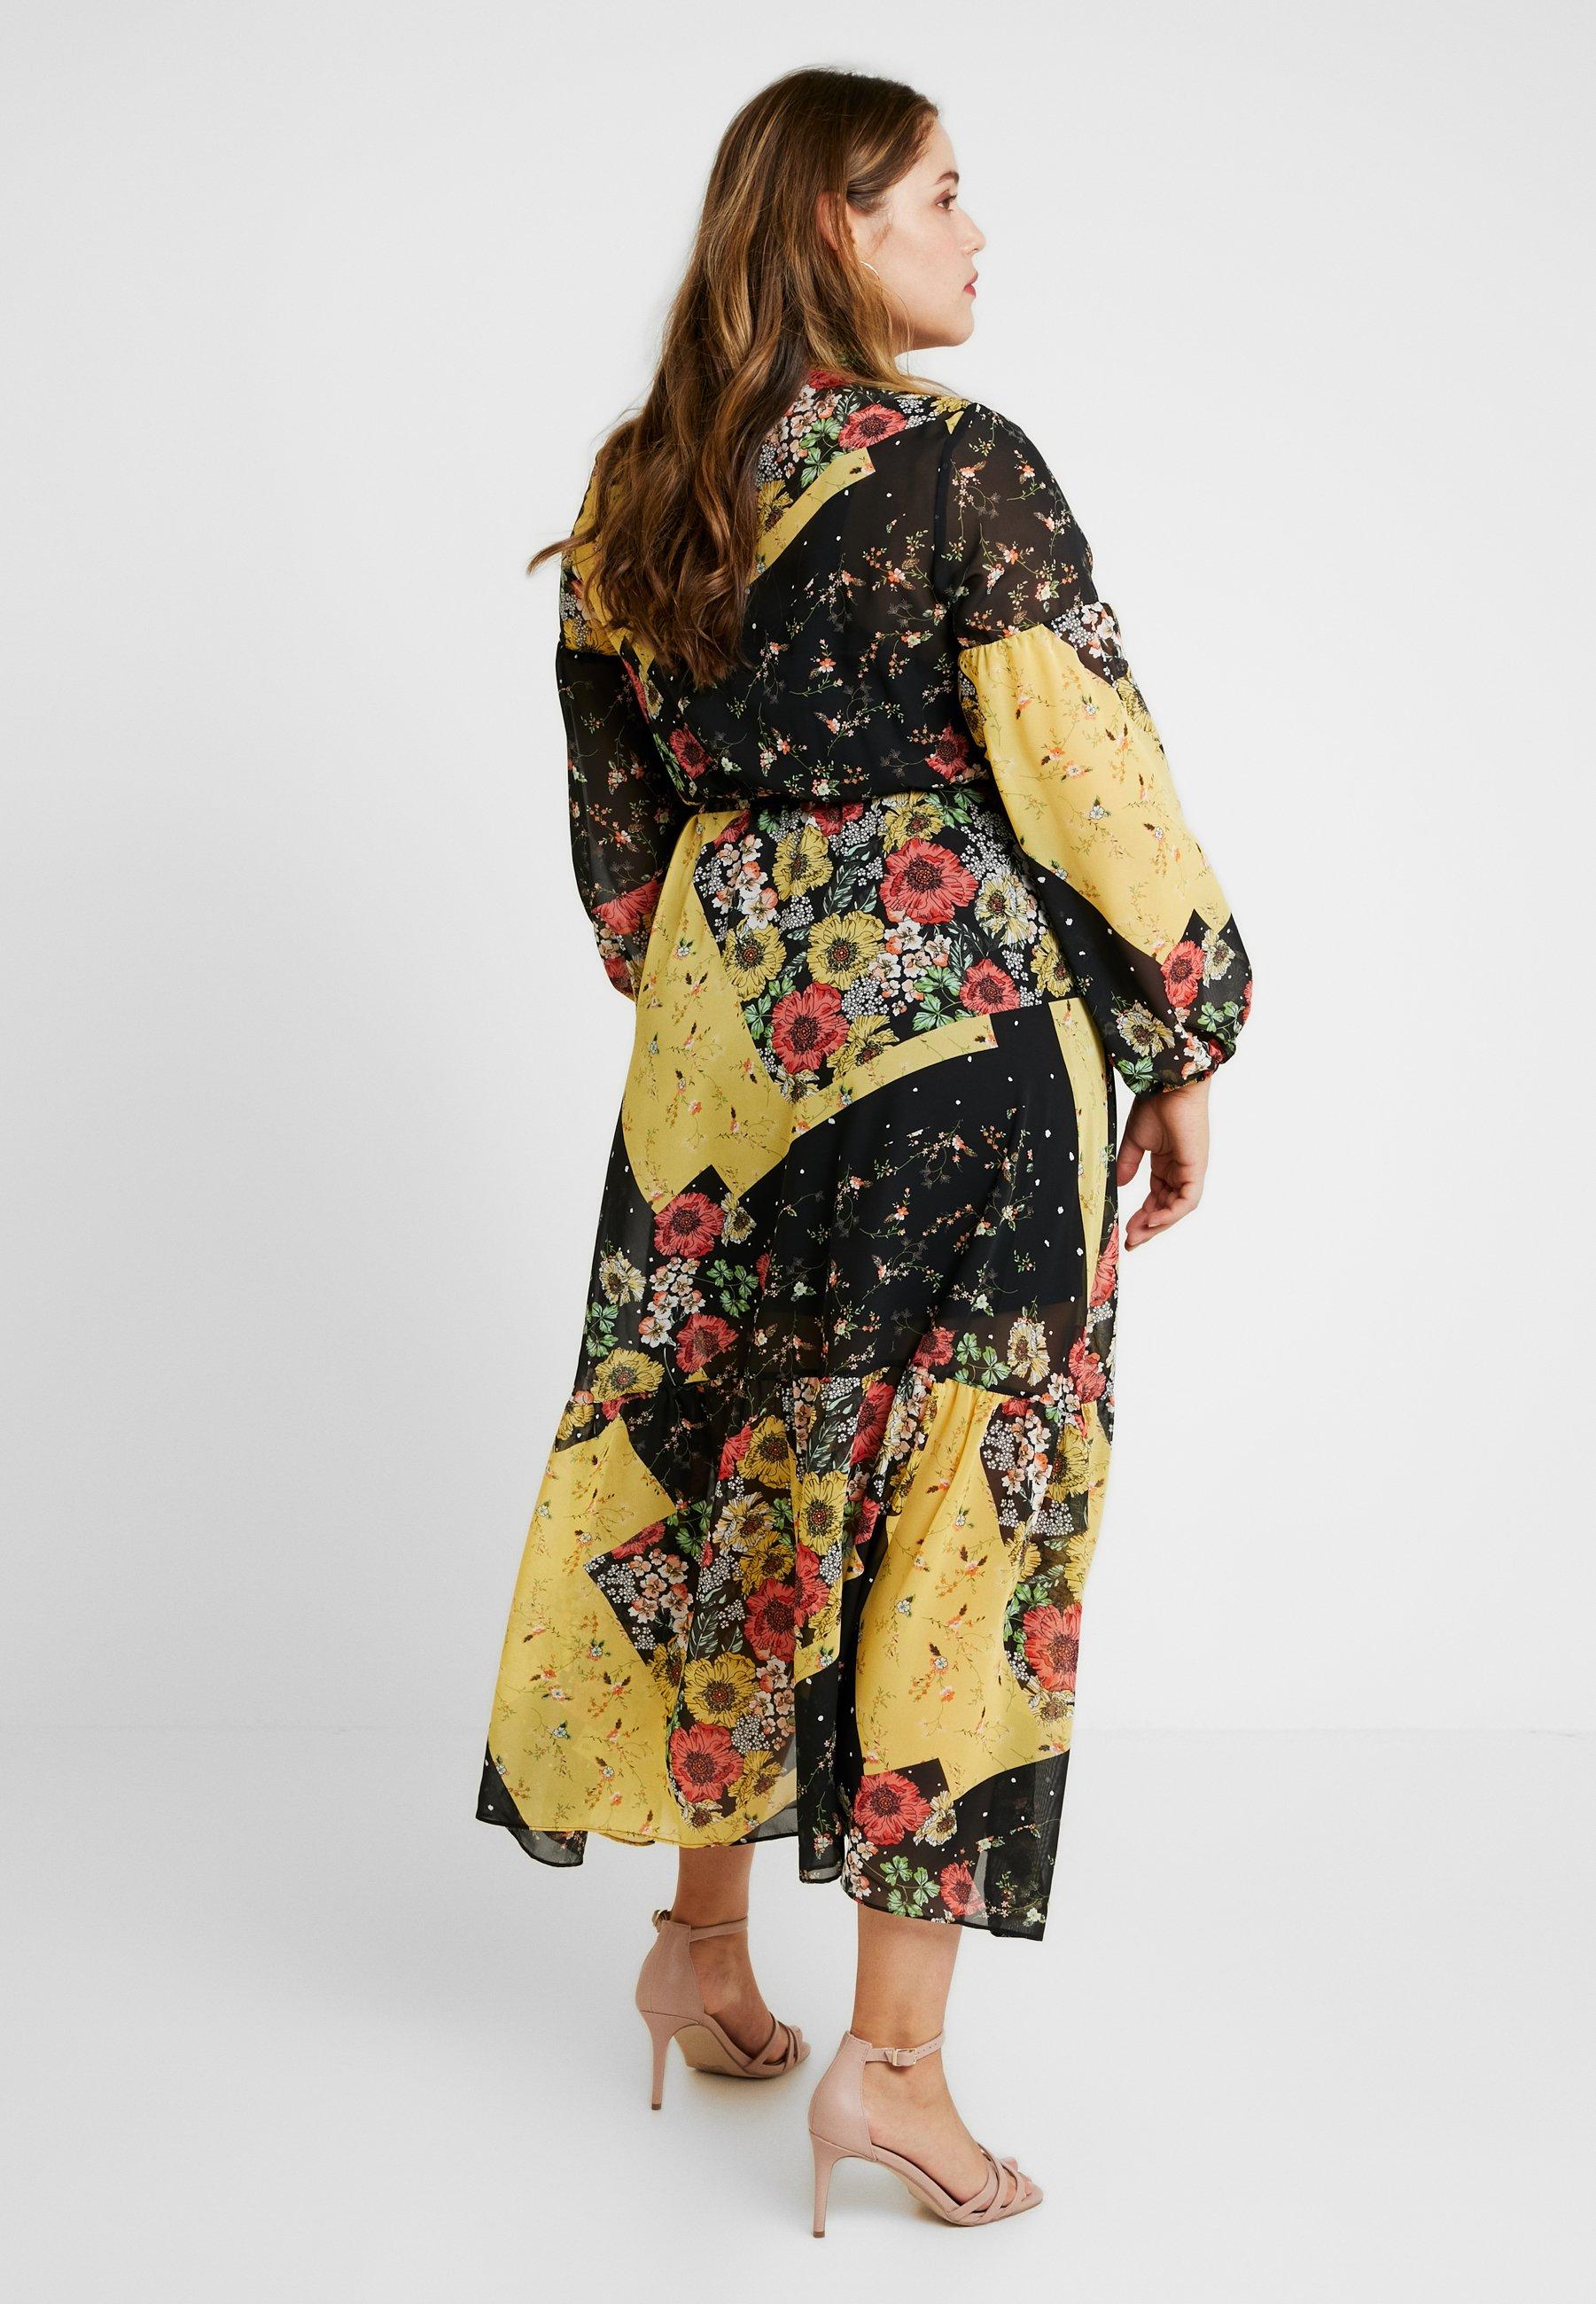 DressRobe Longue Simply Be Peasant Patchwork uTJ3Klc15F